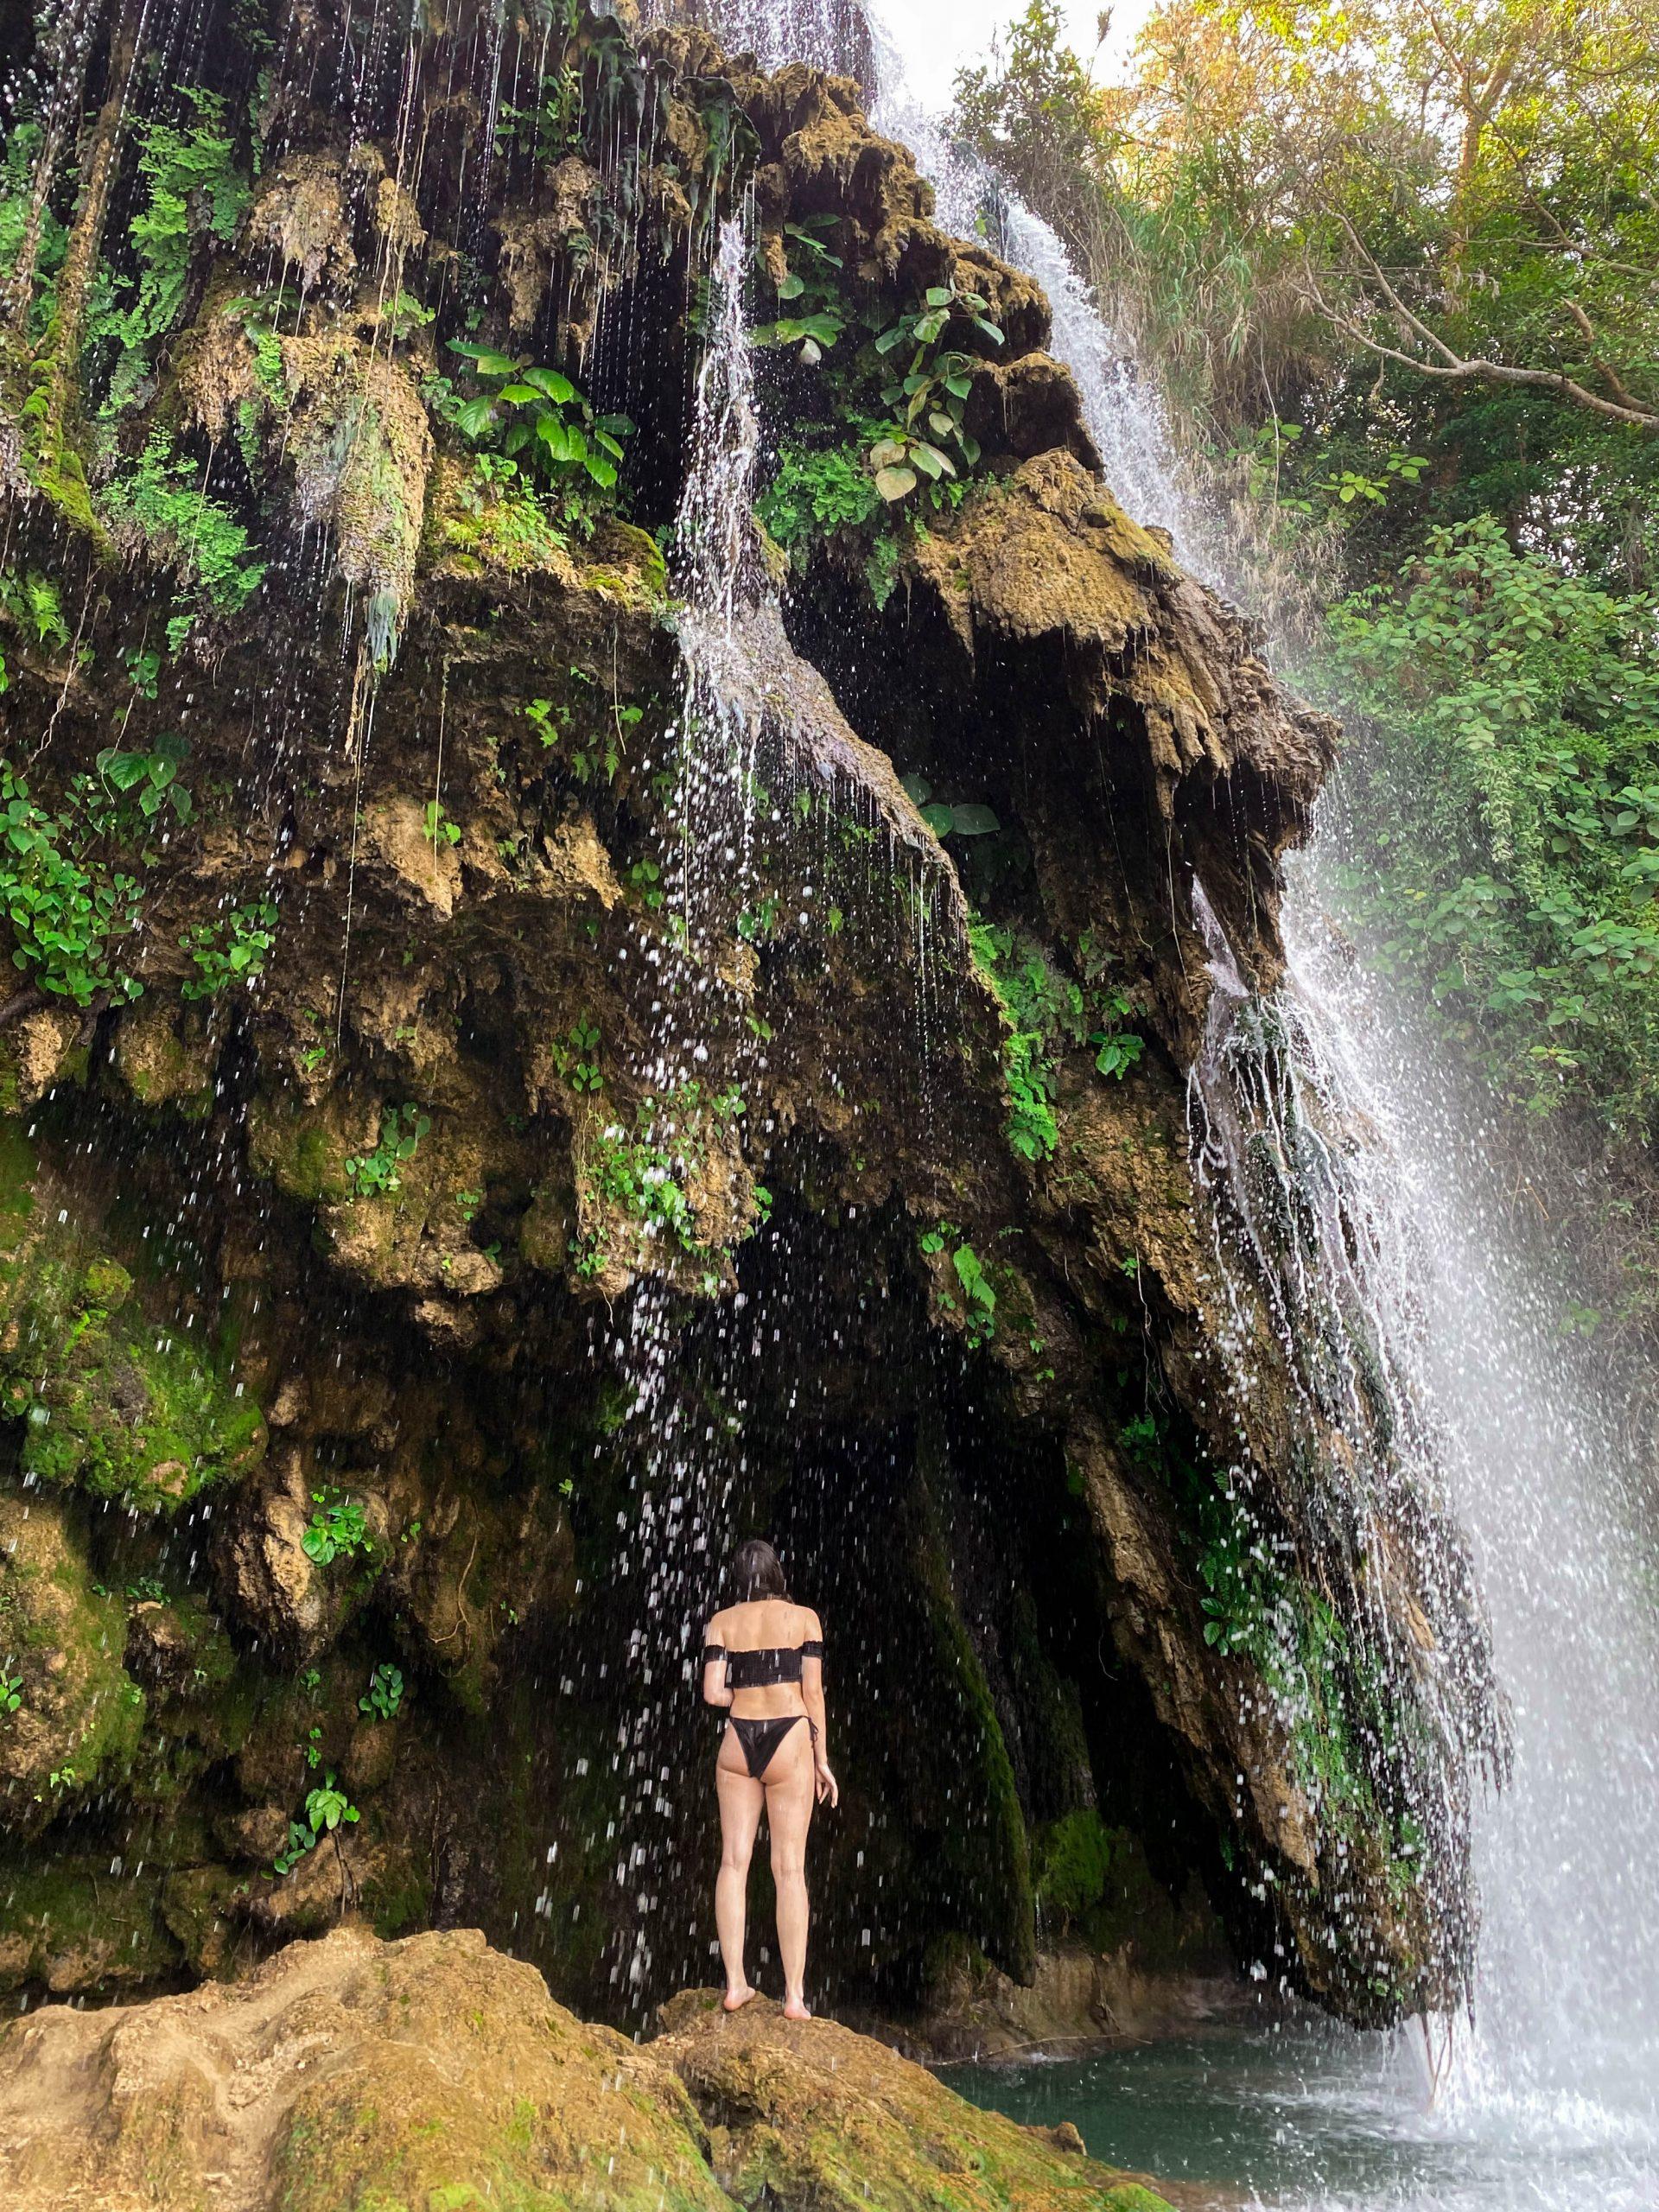 Cascadas de Tamasopo waterfall cave outdoor adventure travel la huasteca potosina san luis potosi mexico woman black bikini